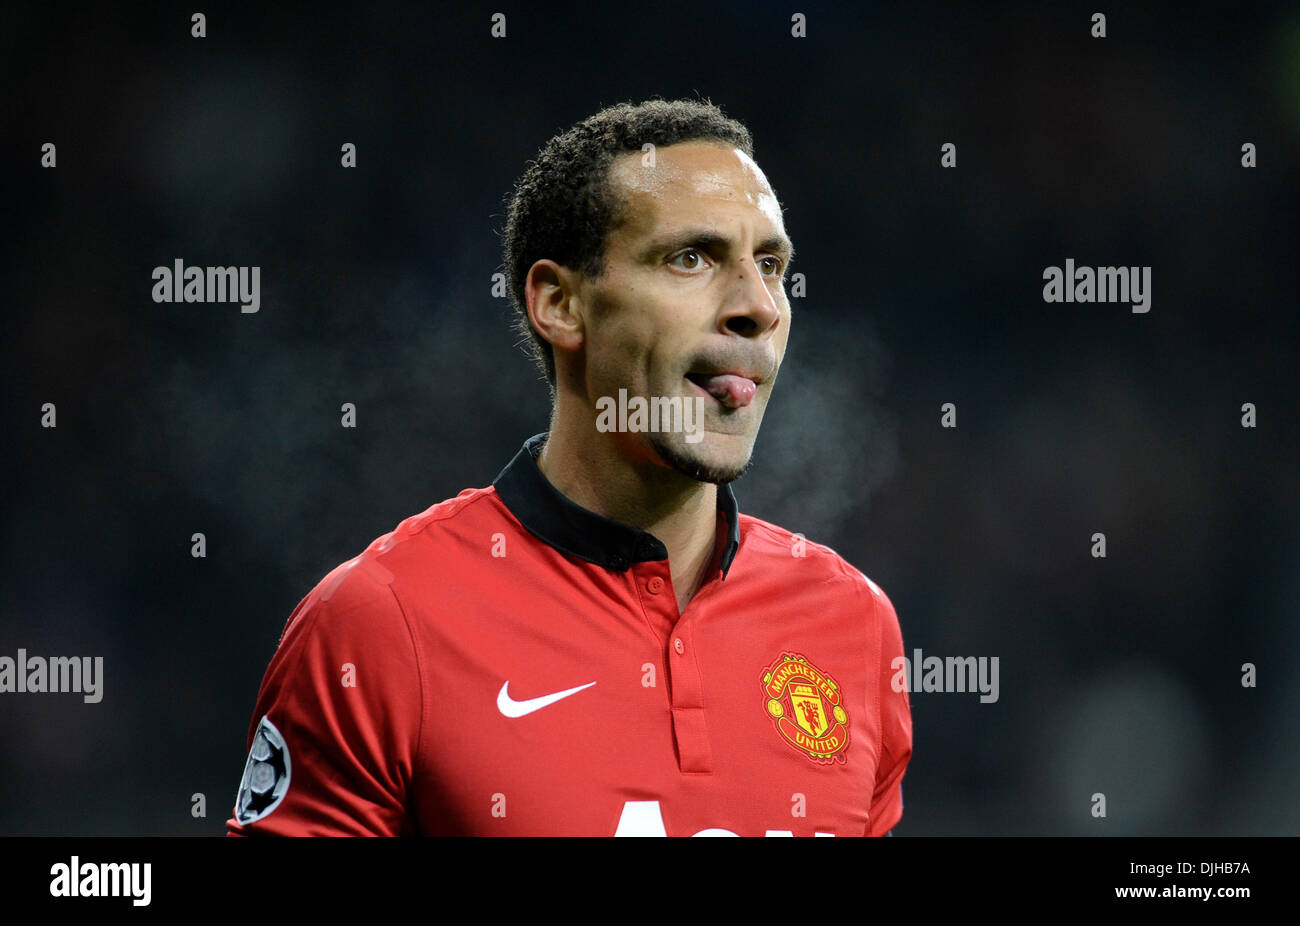 Rio Ferdinand Manchester United Football Imágenes De Stock   Rio ... f8029f04faf0b